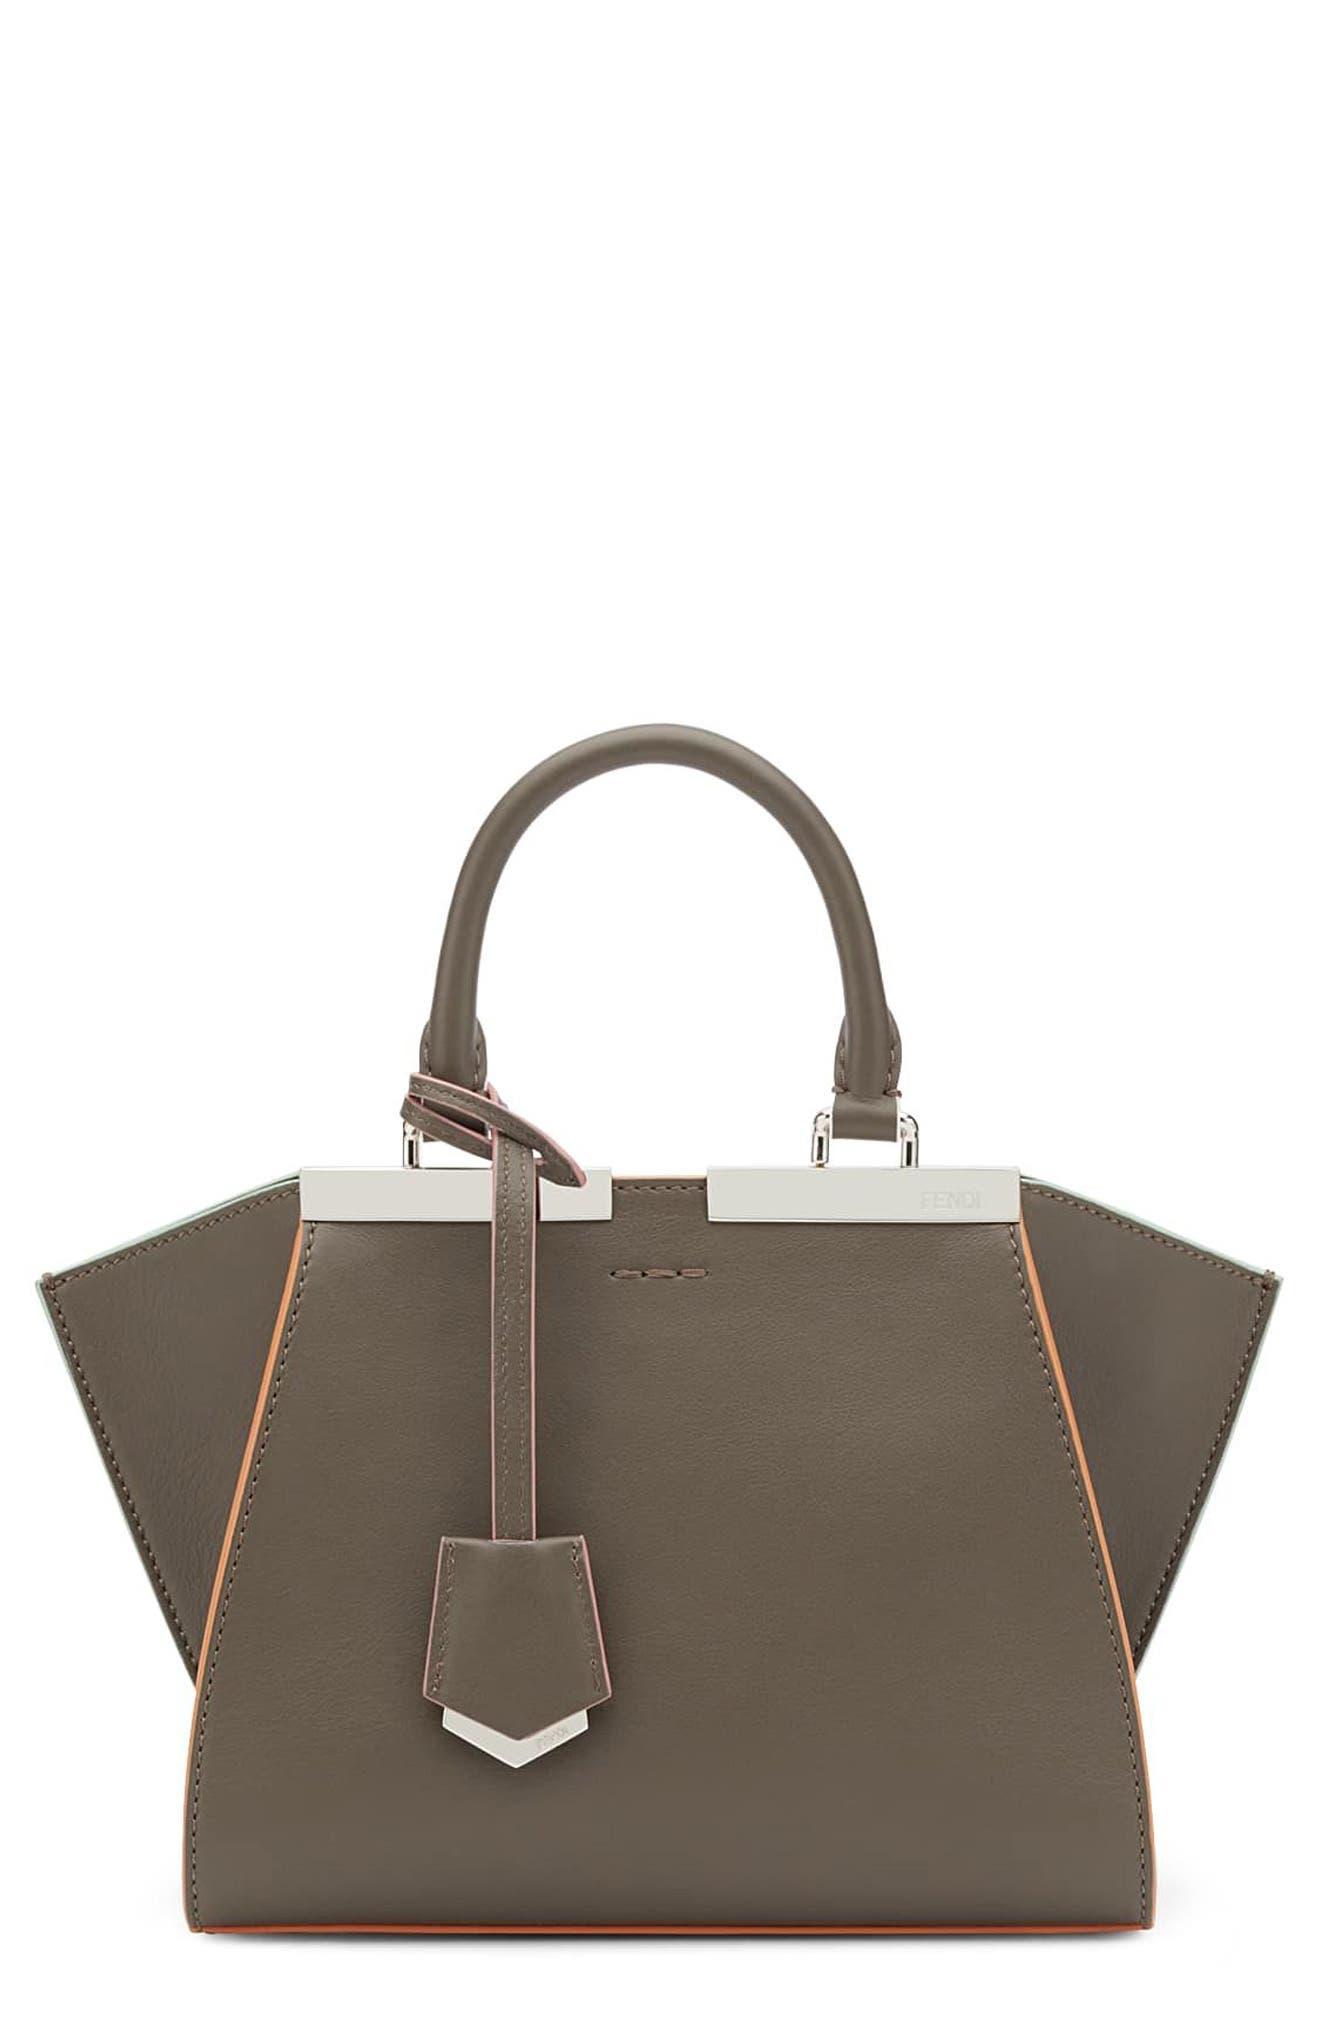 'Mini 3Jours' Calfskin Leather Shopper,                             Main thumbnail 1, color,                             077